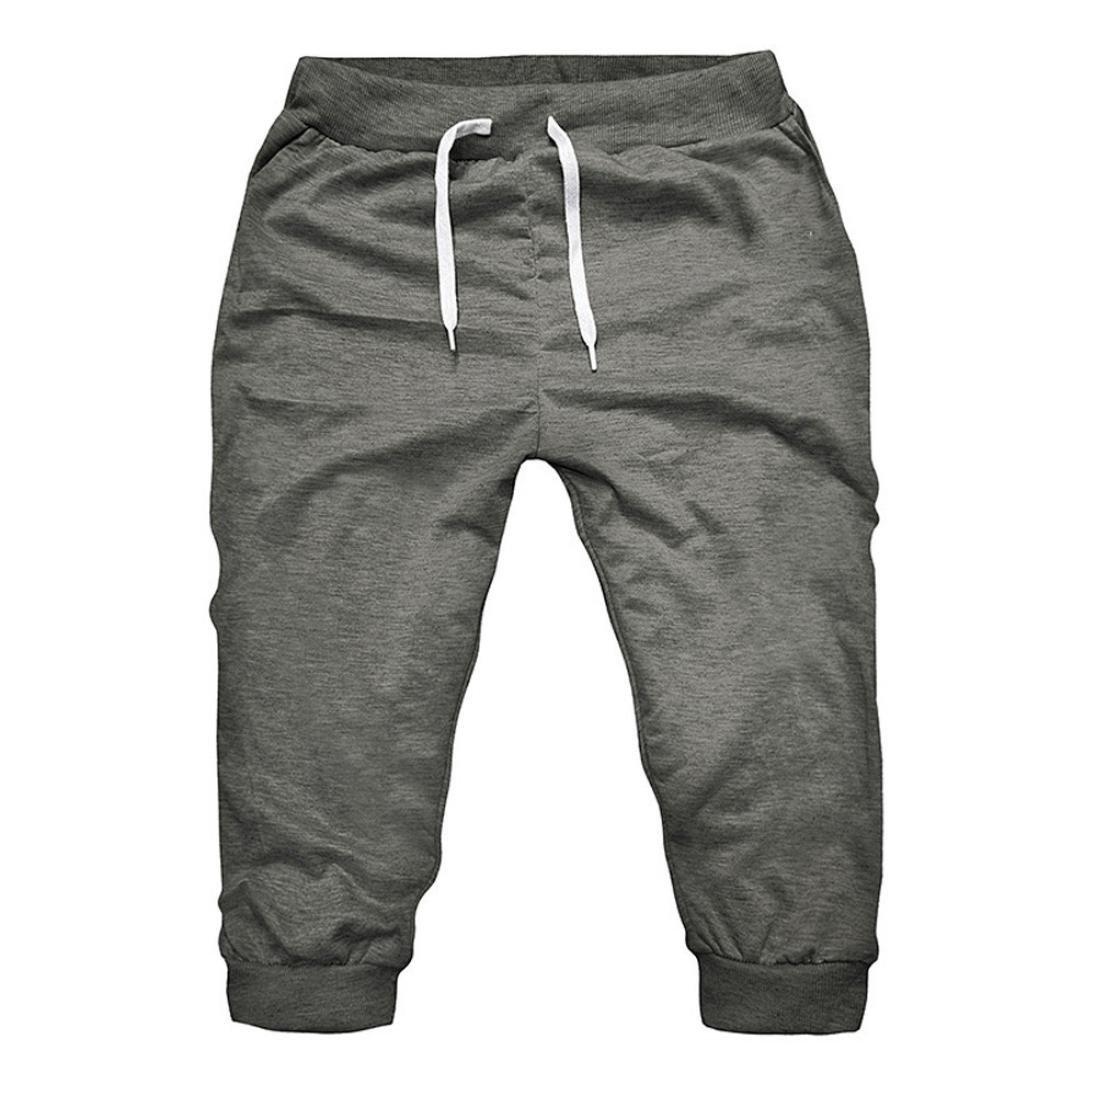 Hombres Pantalones, ❤️ Manadlian Pantalones harén para hombre Casual Persona que practica jogging Baile Sportwear Baggy Pantalones Slacks Pantalones deportivos Manadlian_Hombres Pantalones